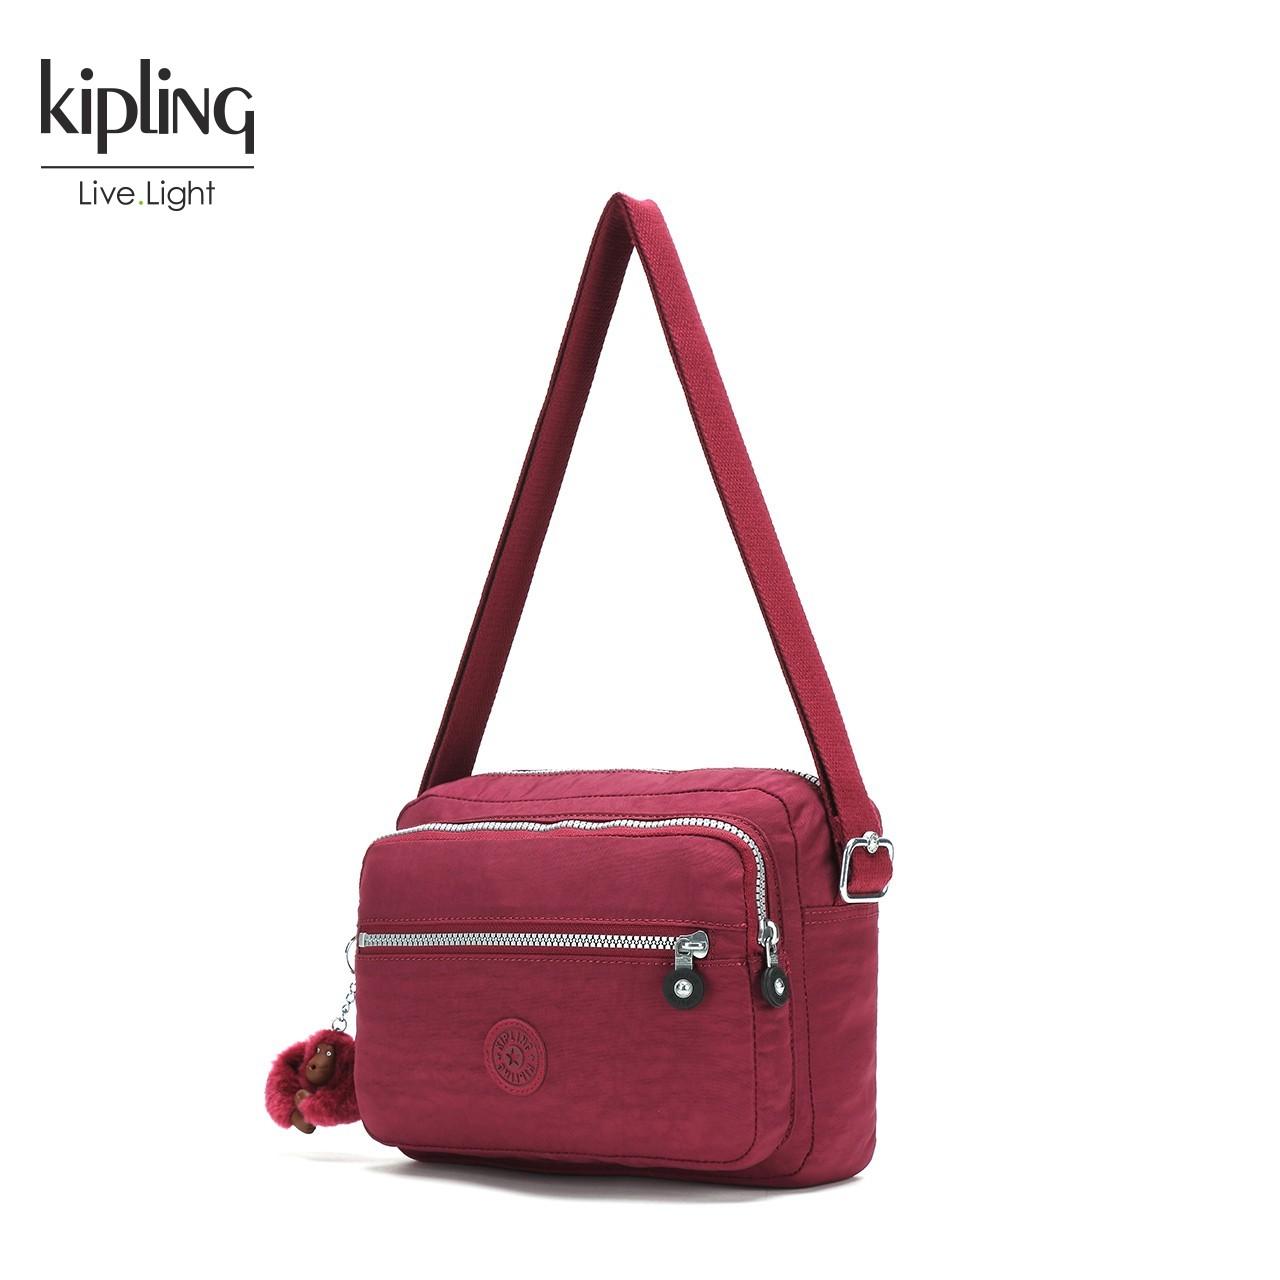 Kipling凯浦林时尚女包斜挎2018新款单肩包包ins超火包斜跨K15249